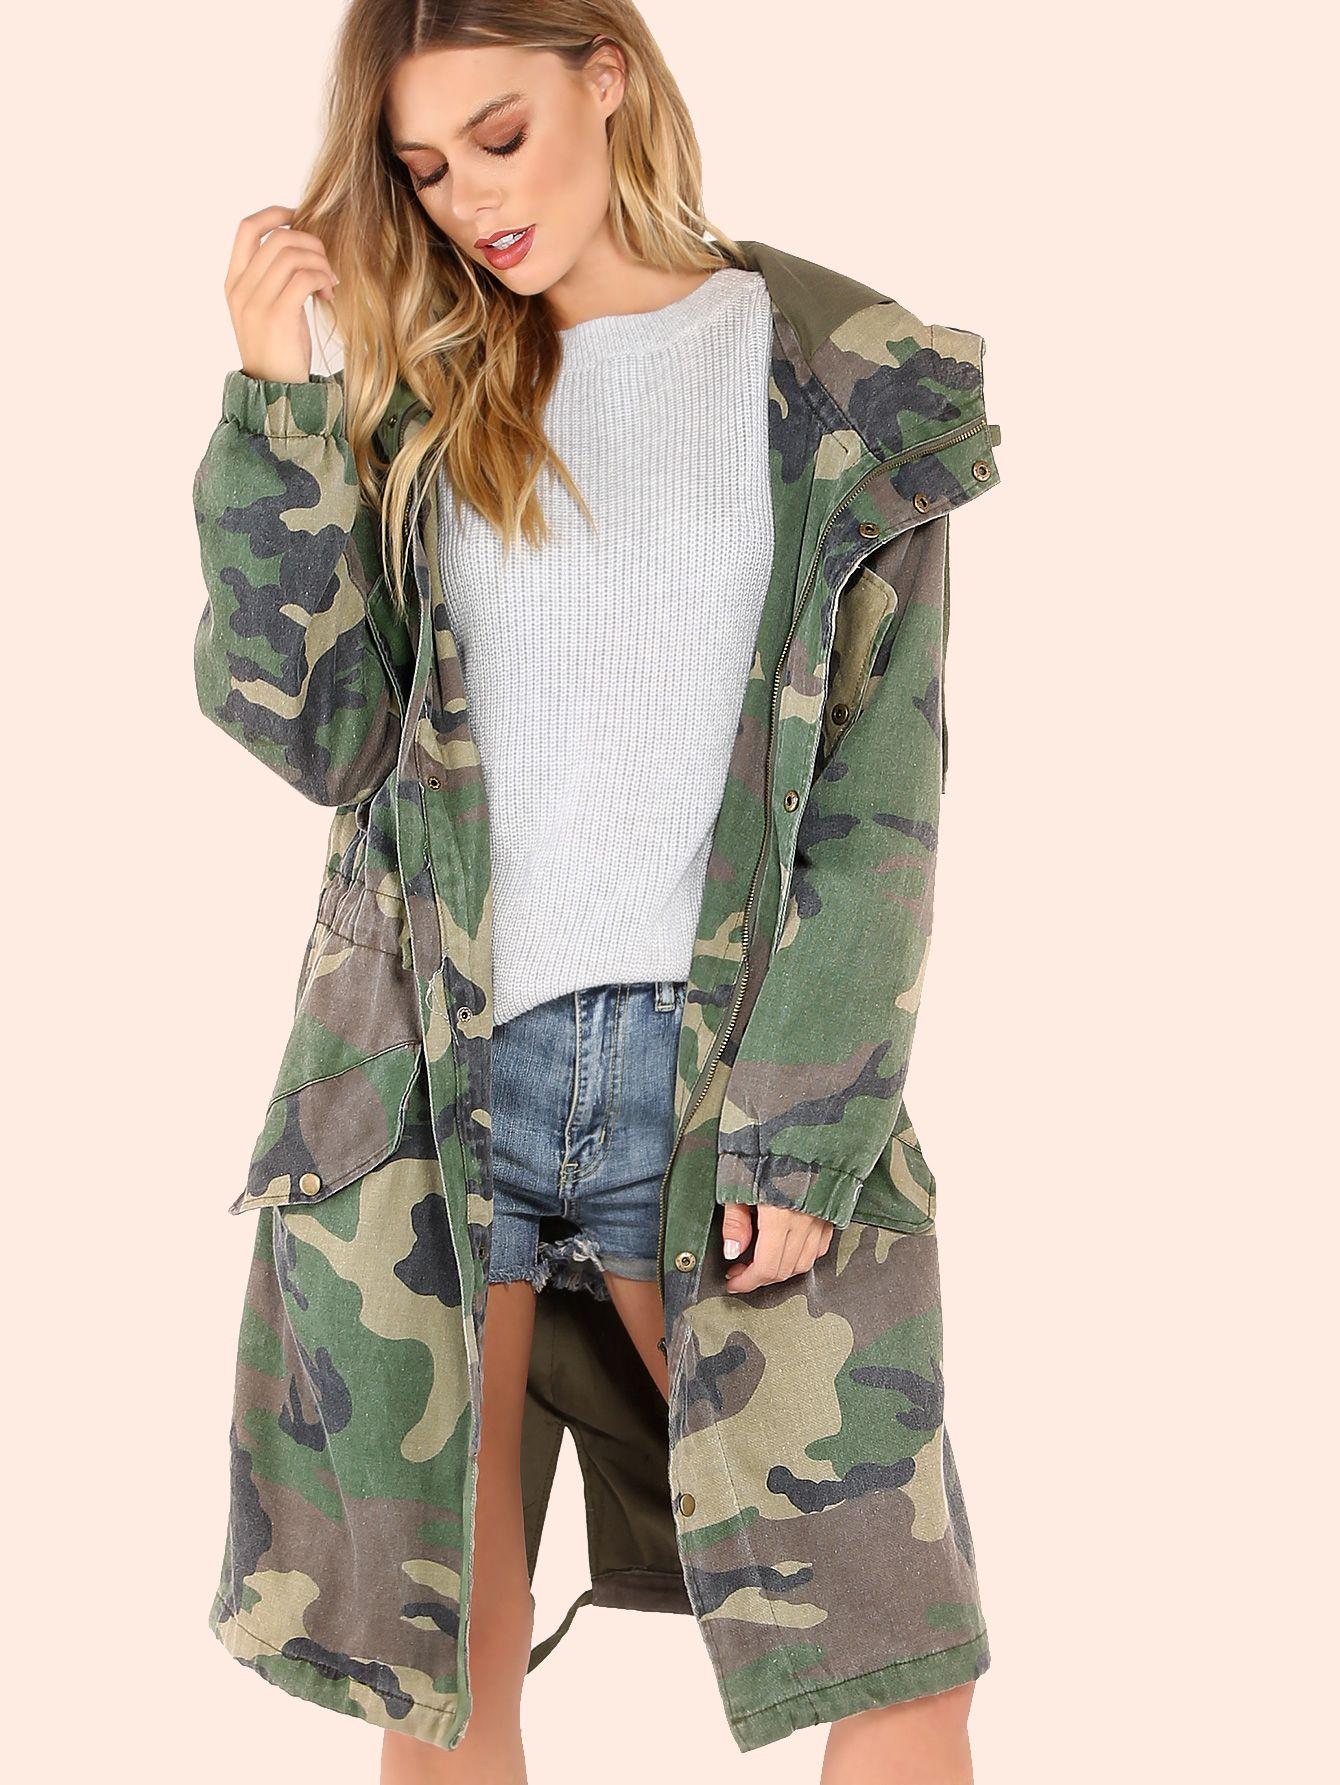 e0eef85280f2b Shop Oversized Camo Utility Jacket CAMOUFLAGE online. SheIn offers Oversized  Camo Utility Jacket CAMOUFLAGE   more to fit your fashionable needs.